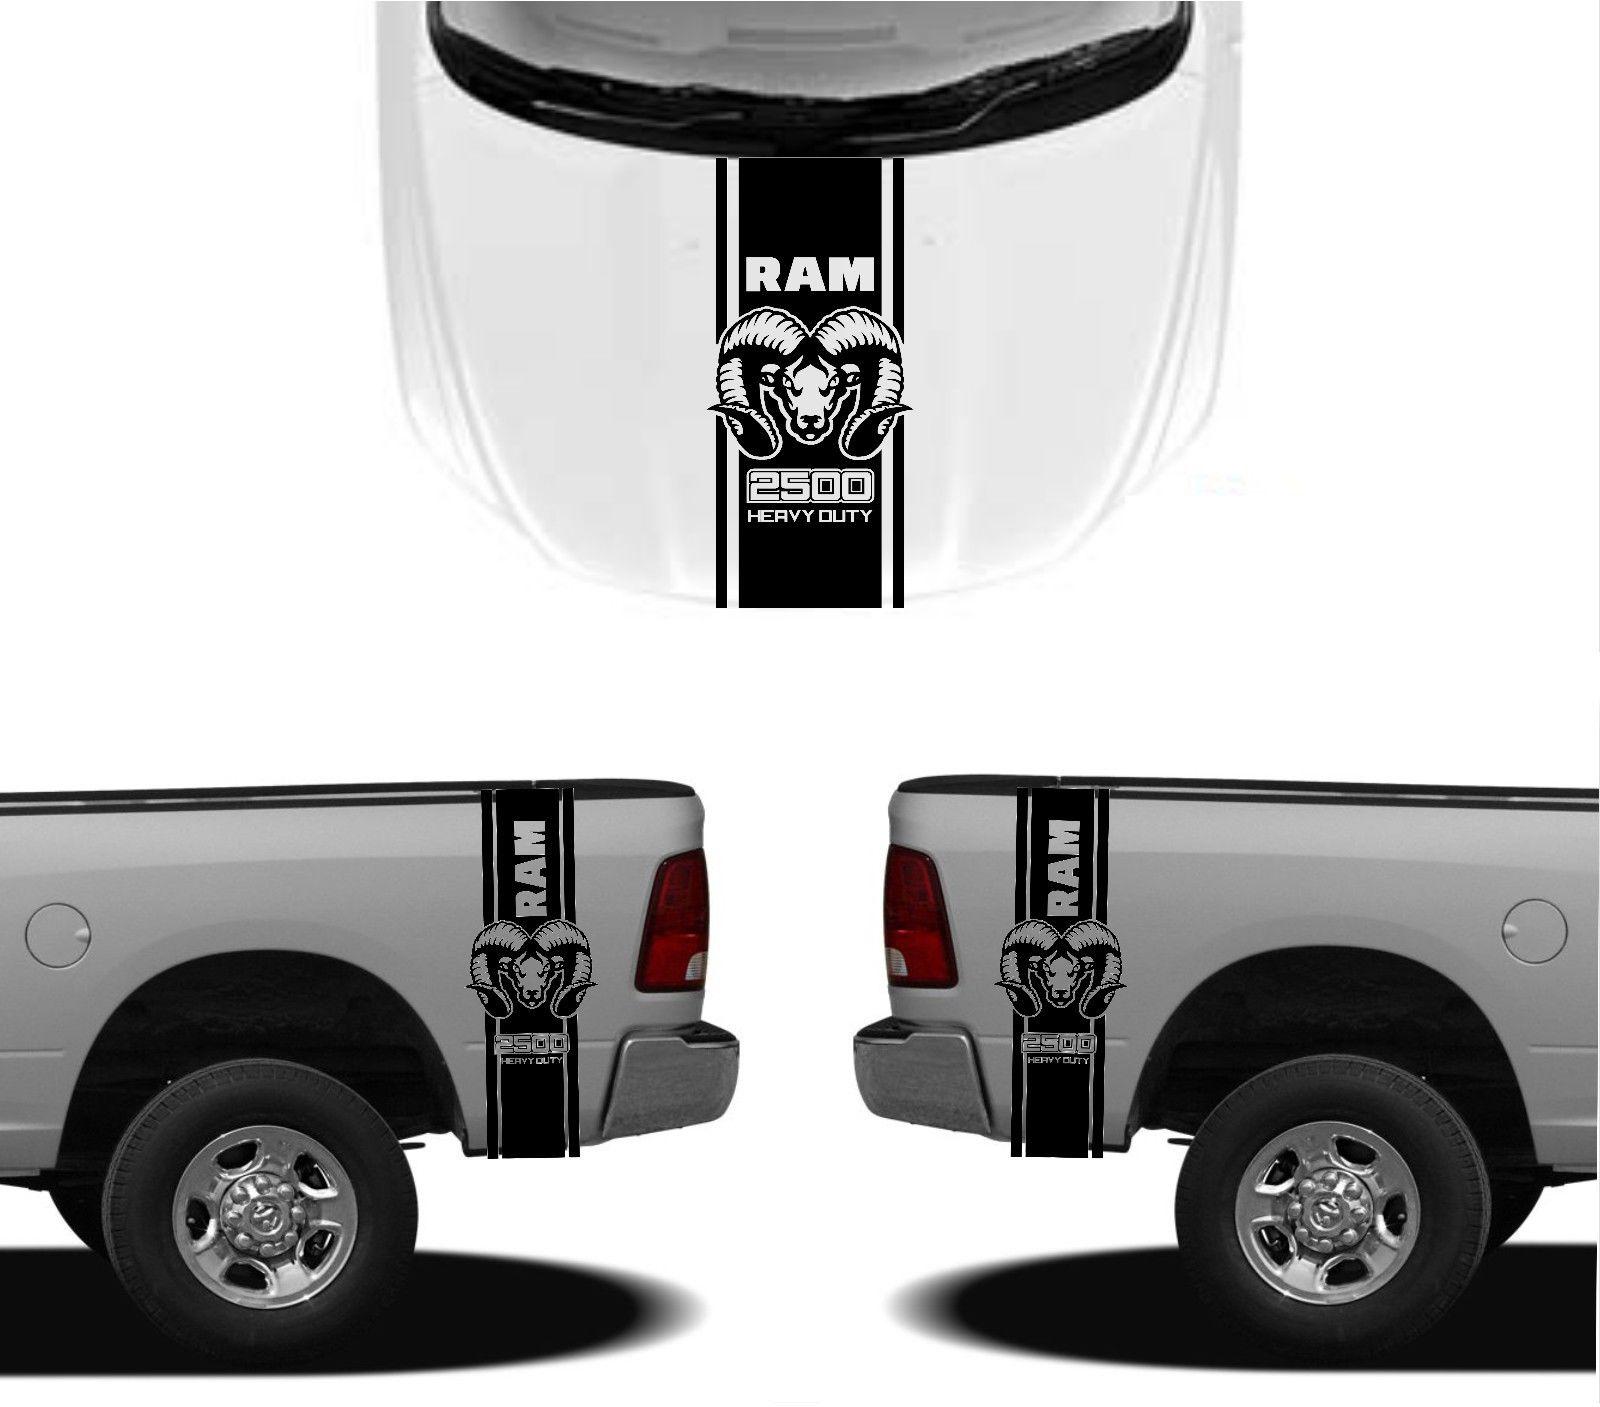 3X DODGE HOOD FENDER AUFKLEBER RAM HEMI 2500 1500 Grafik Vinyl Gehäuse Aufkleber